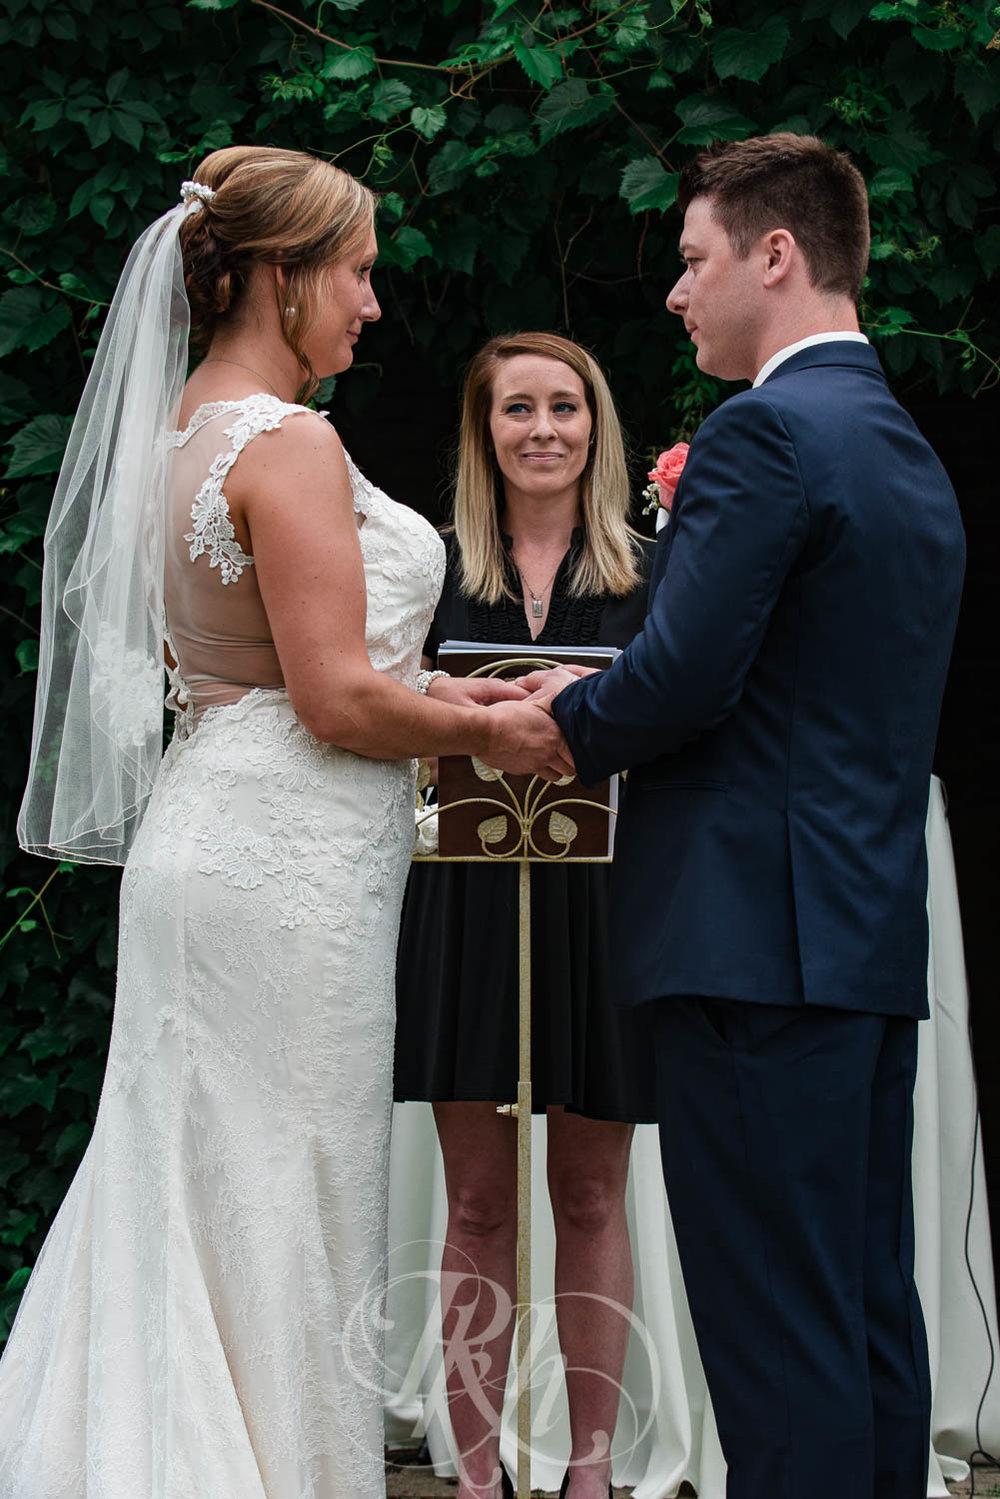 Jackie & Jan - Mankato Wedding Photography - Hubbard House - RKH Images - Blog  (15 of 22).jpg